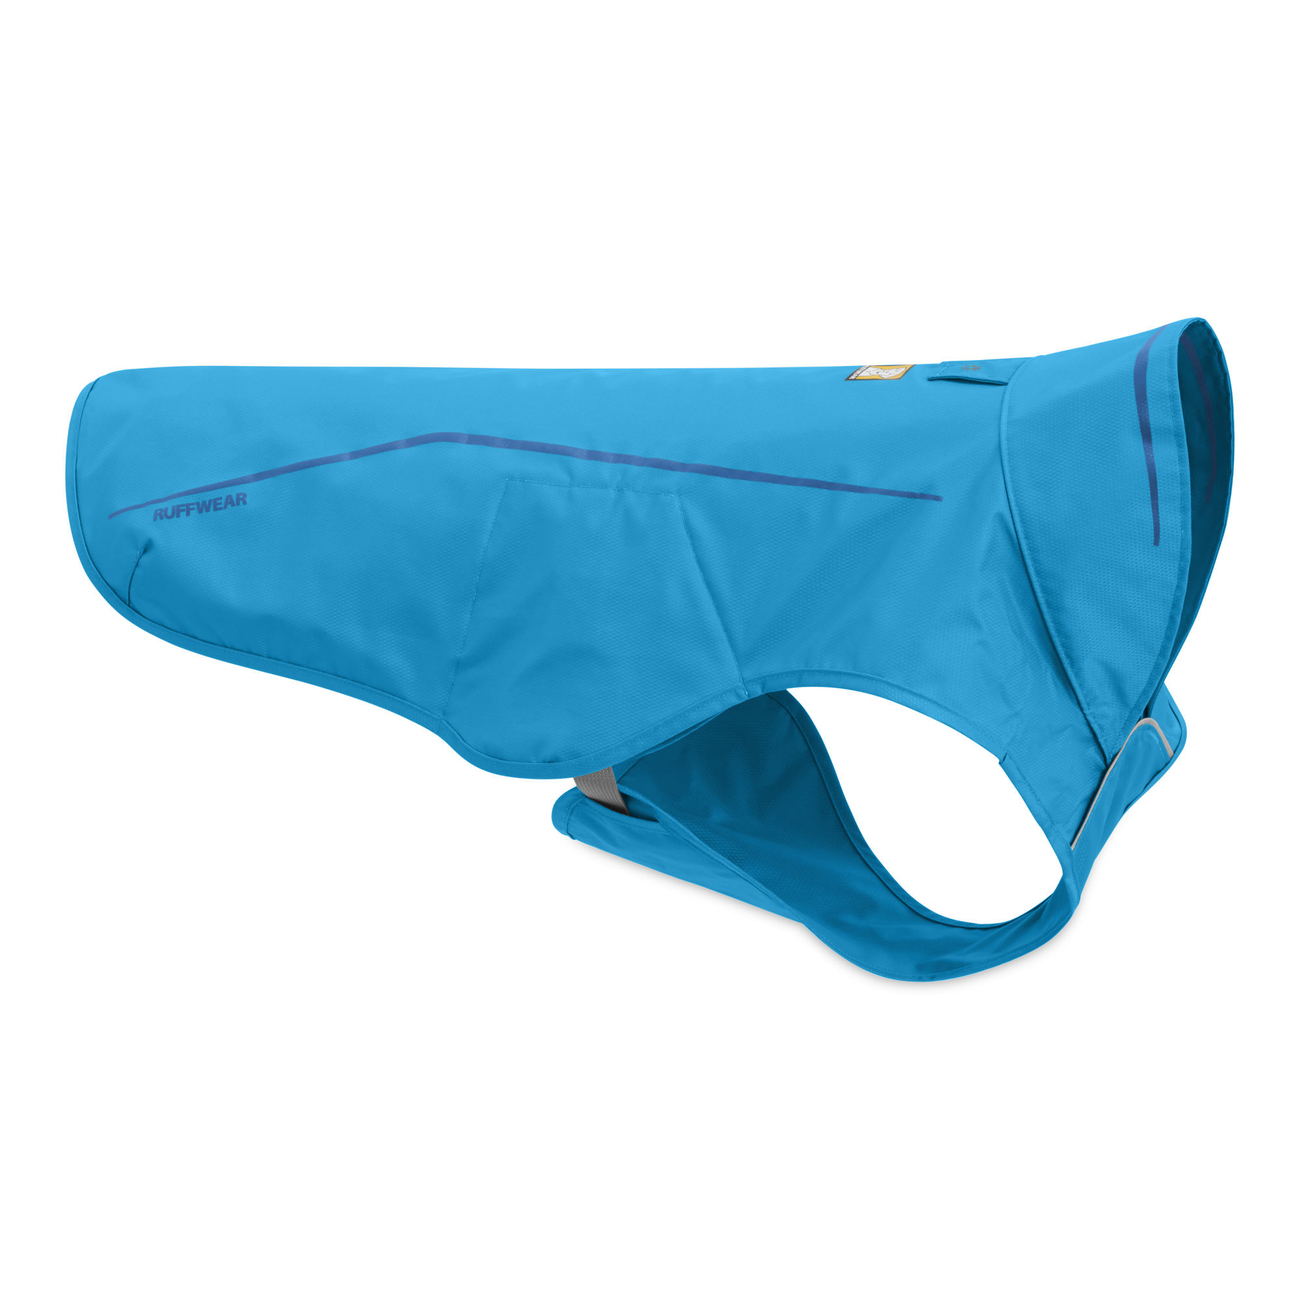 Ruffwear Sun Shower Regenjacke für Hunde, Bild 10